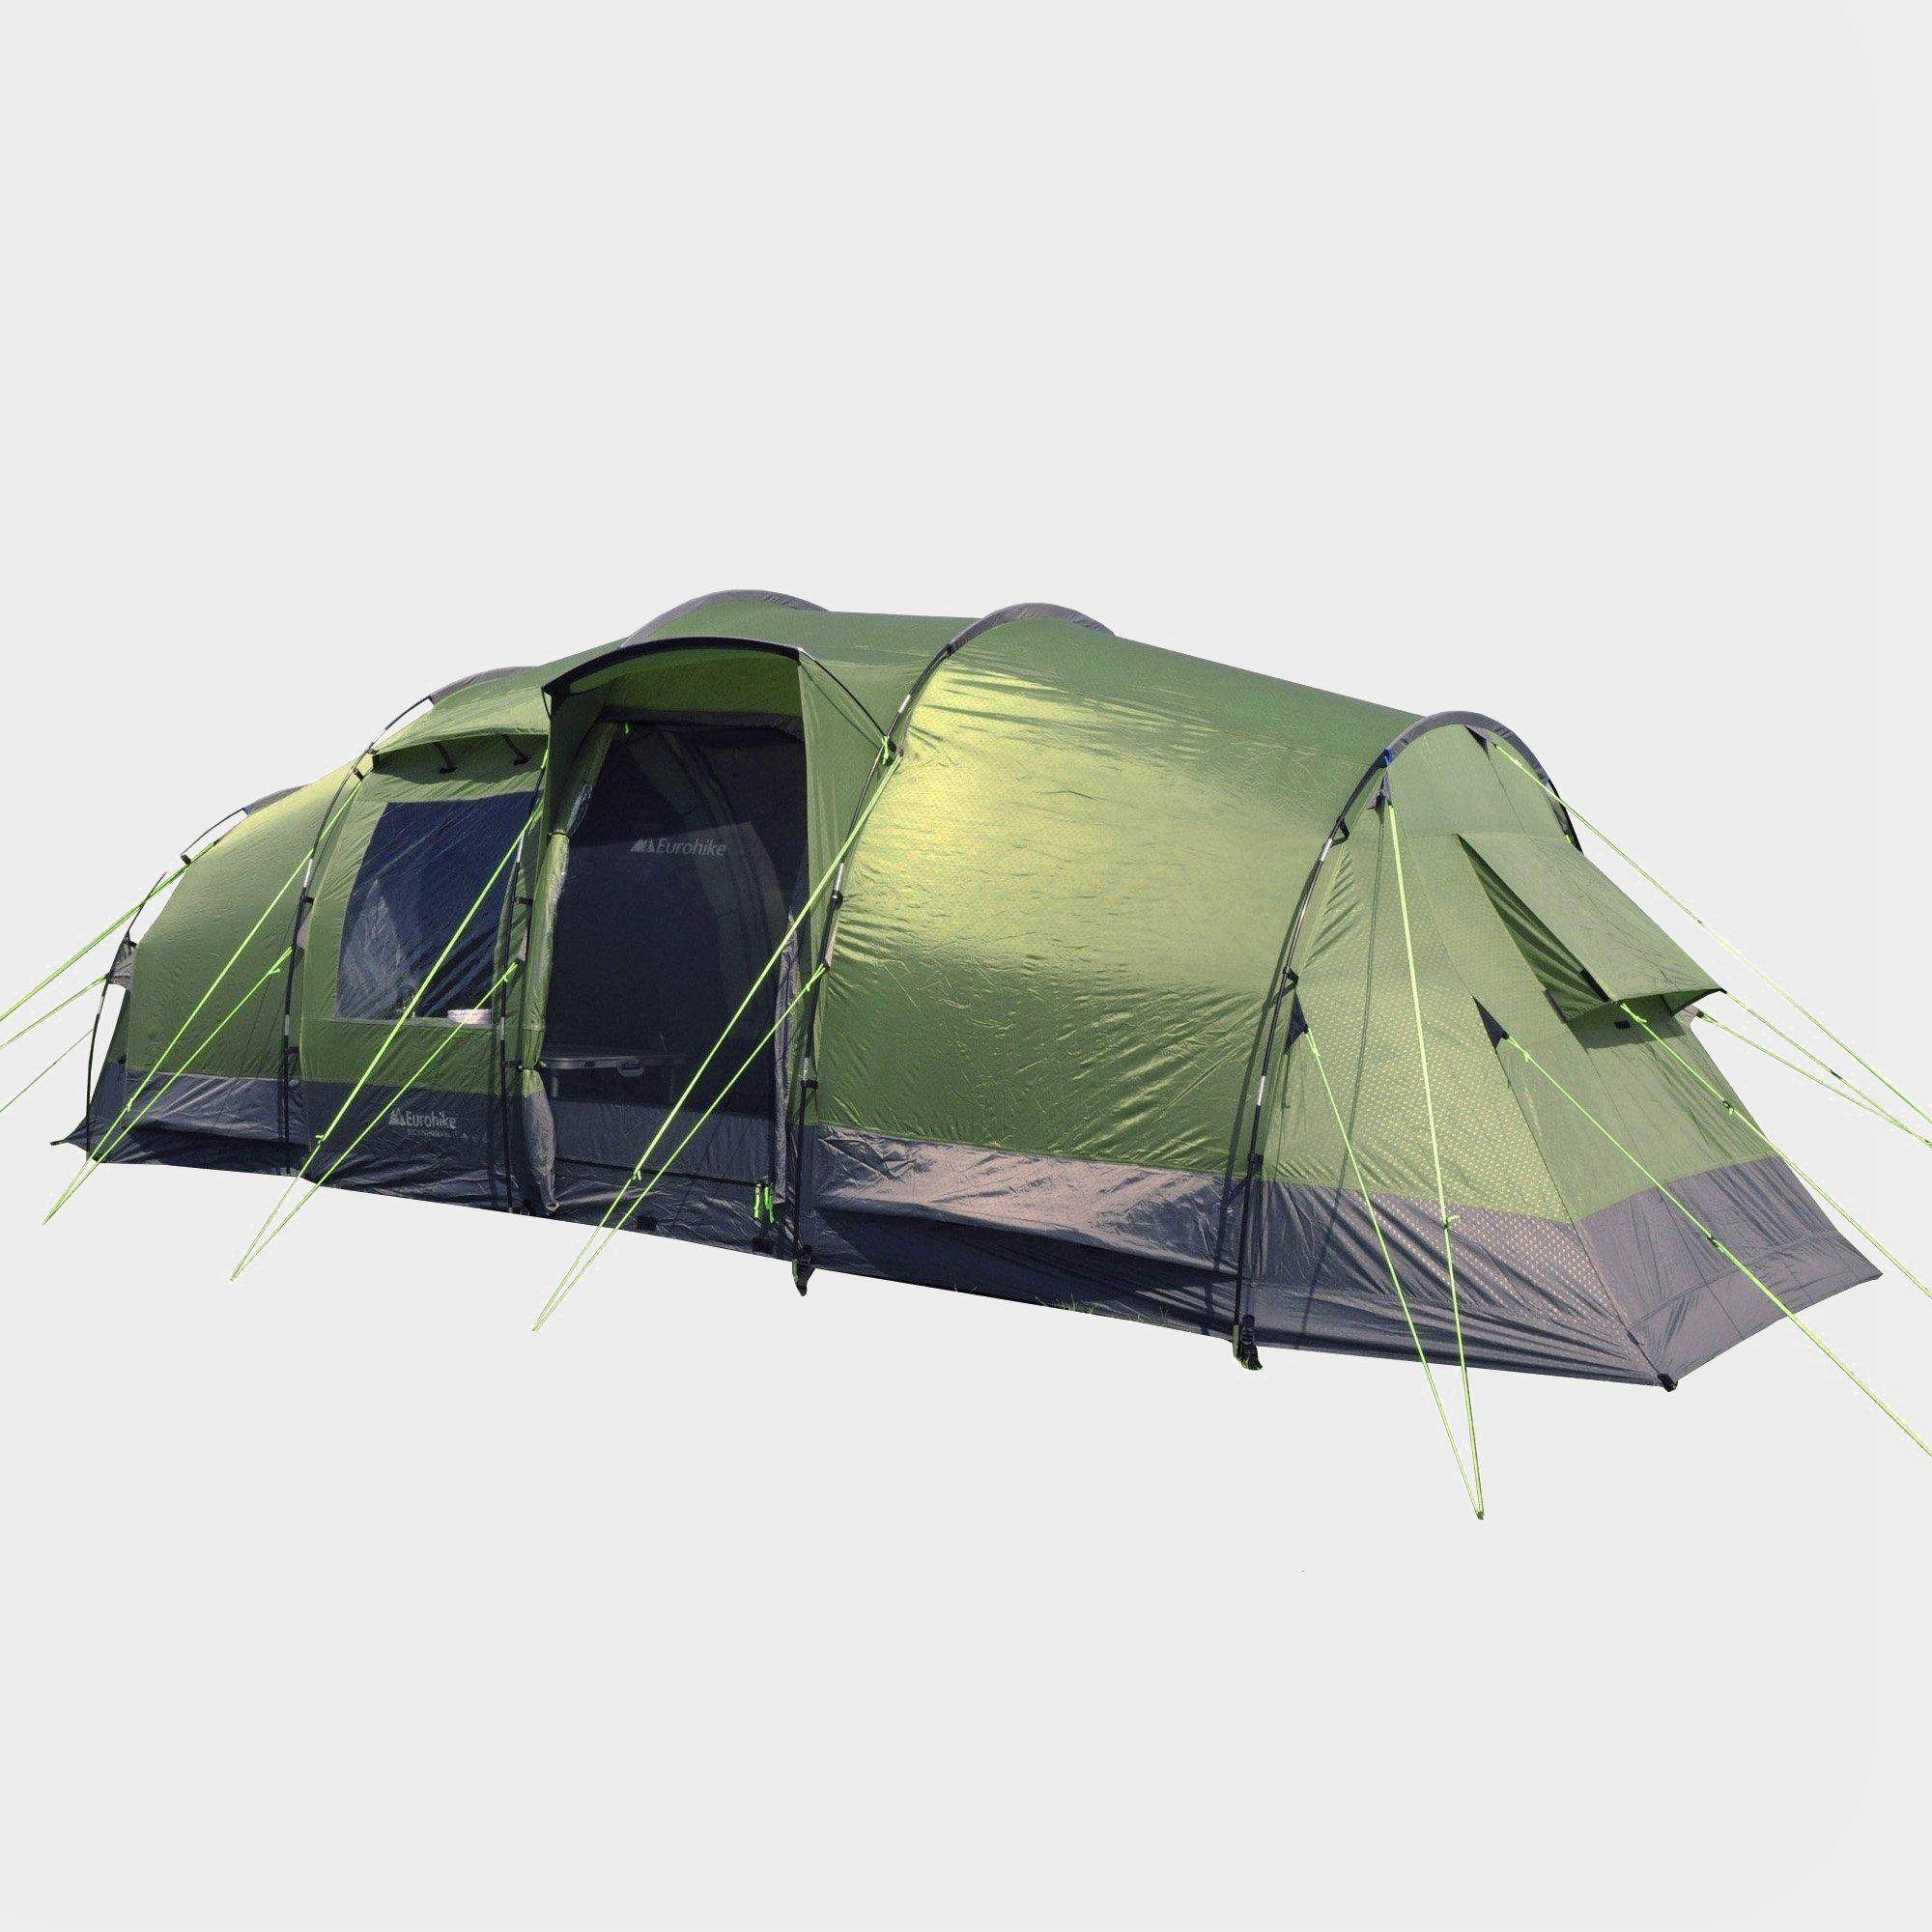 EUROHIKE Buckingham Elite 6 Man Family Tent